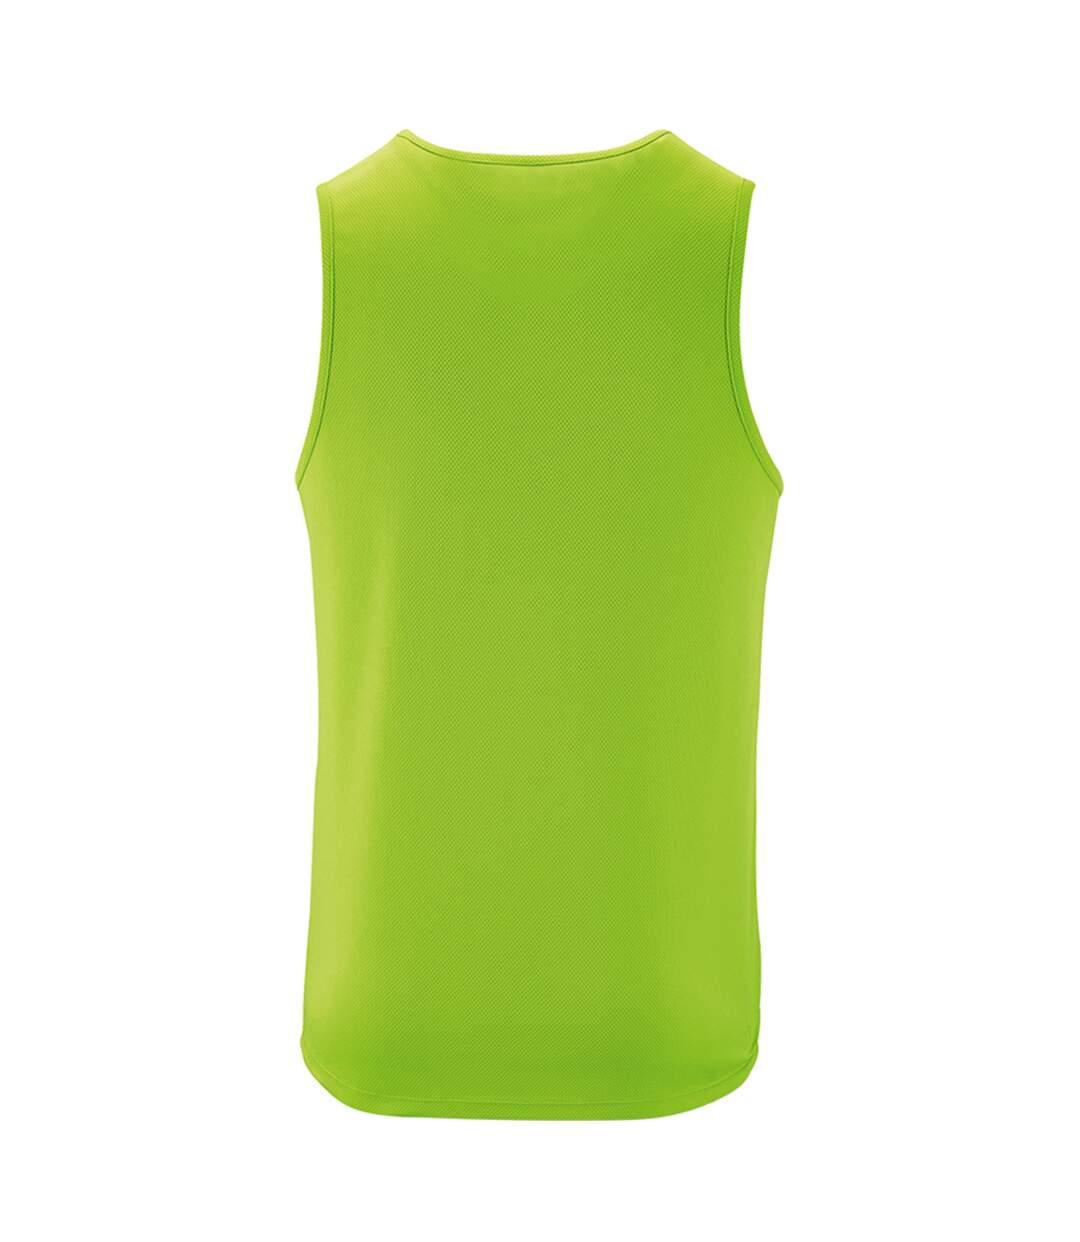 SOLS Mens Sporty Performance Tank Top (Neon Green) - UTPC2904